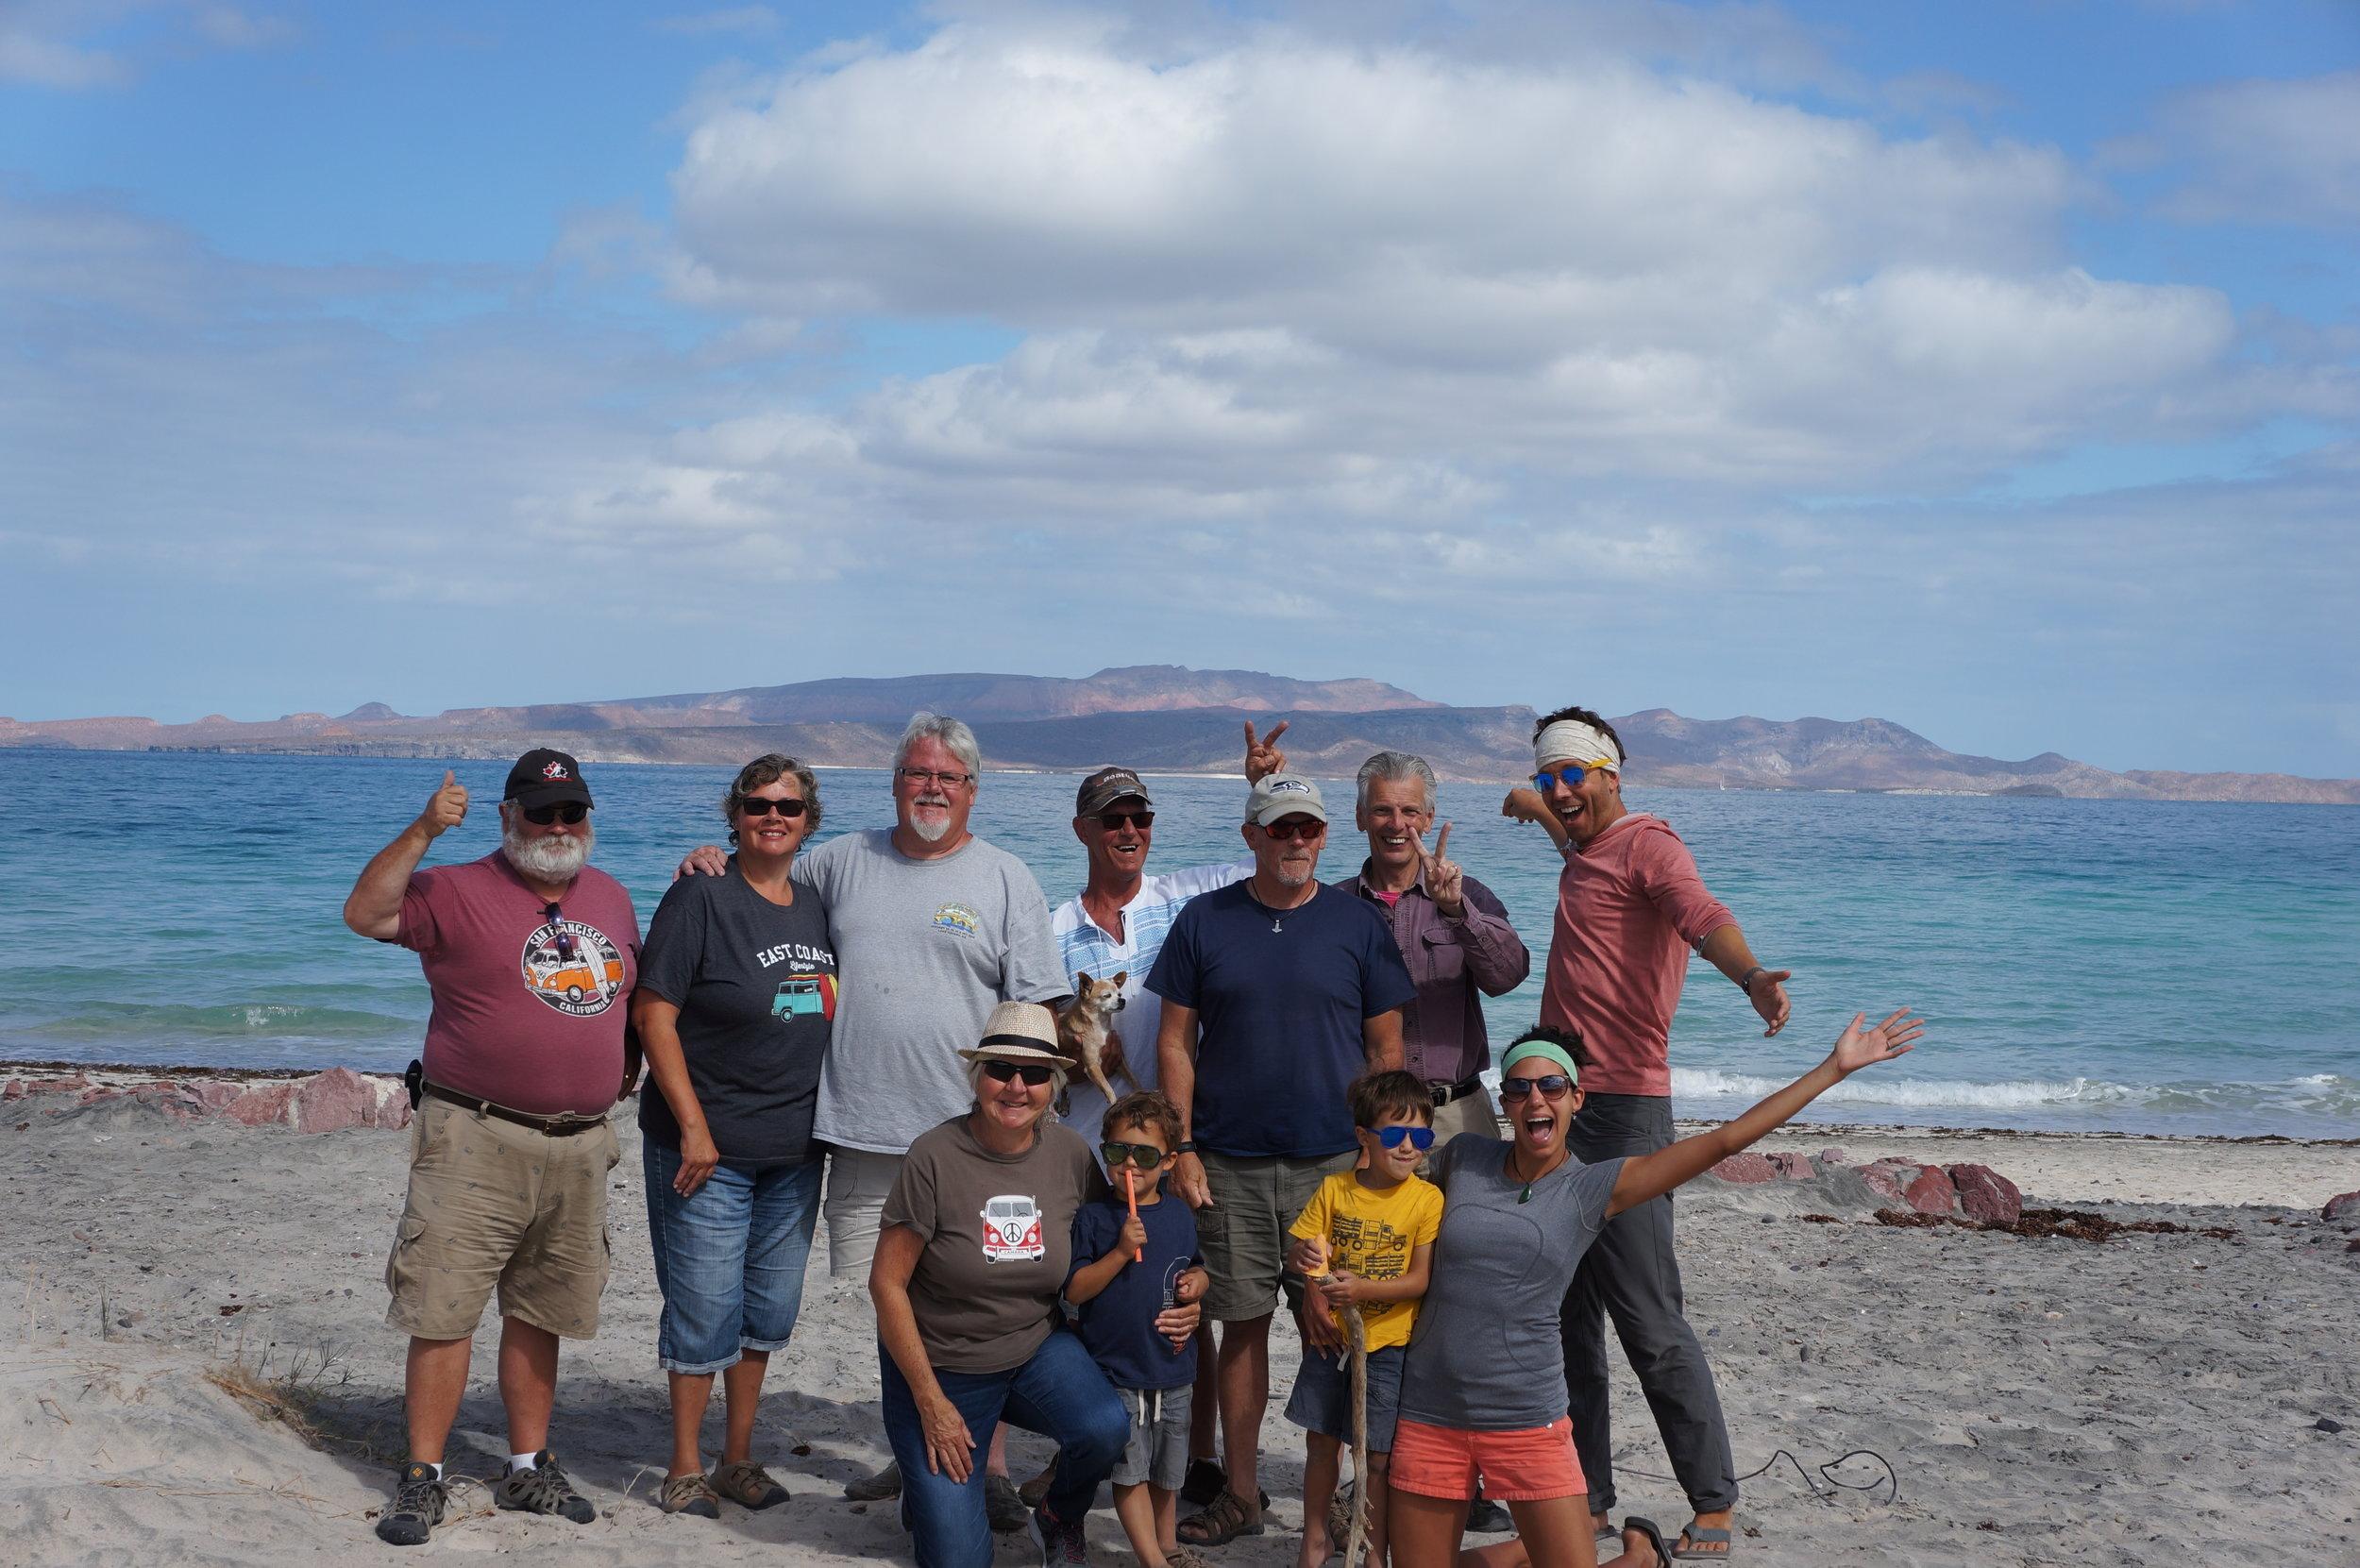 Tecolote Beach, Baja. Barry, Shannon, Brad, Jay (& Goonie the dog), Sam, Roger, Chip, Fern, Reid, Bennett, and myself